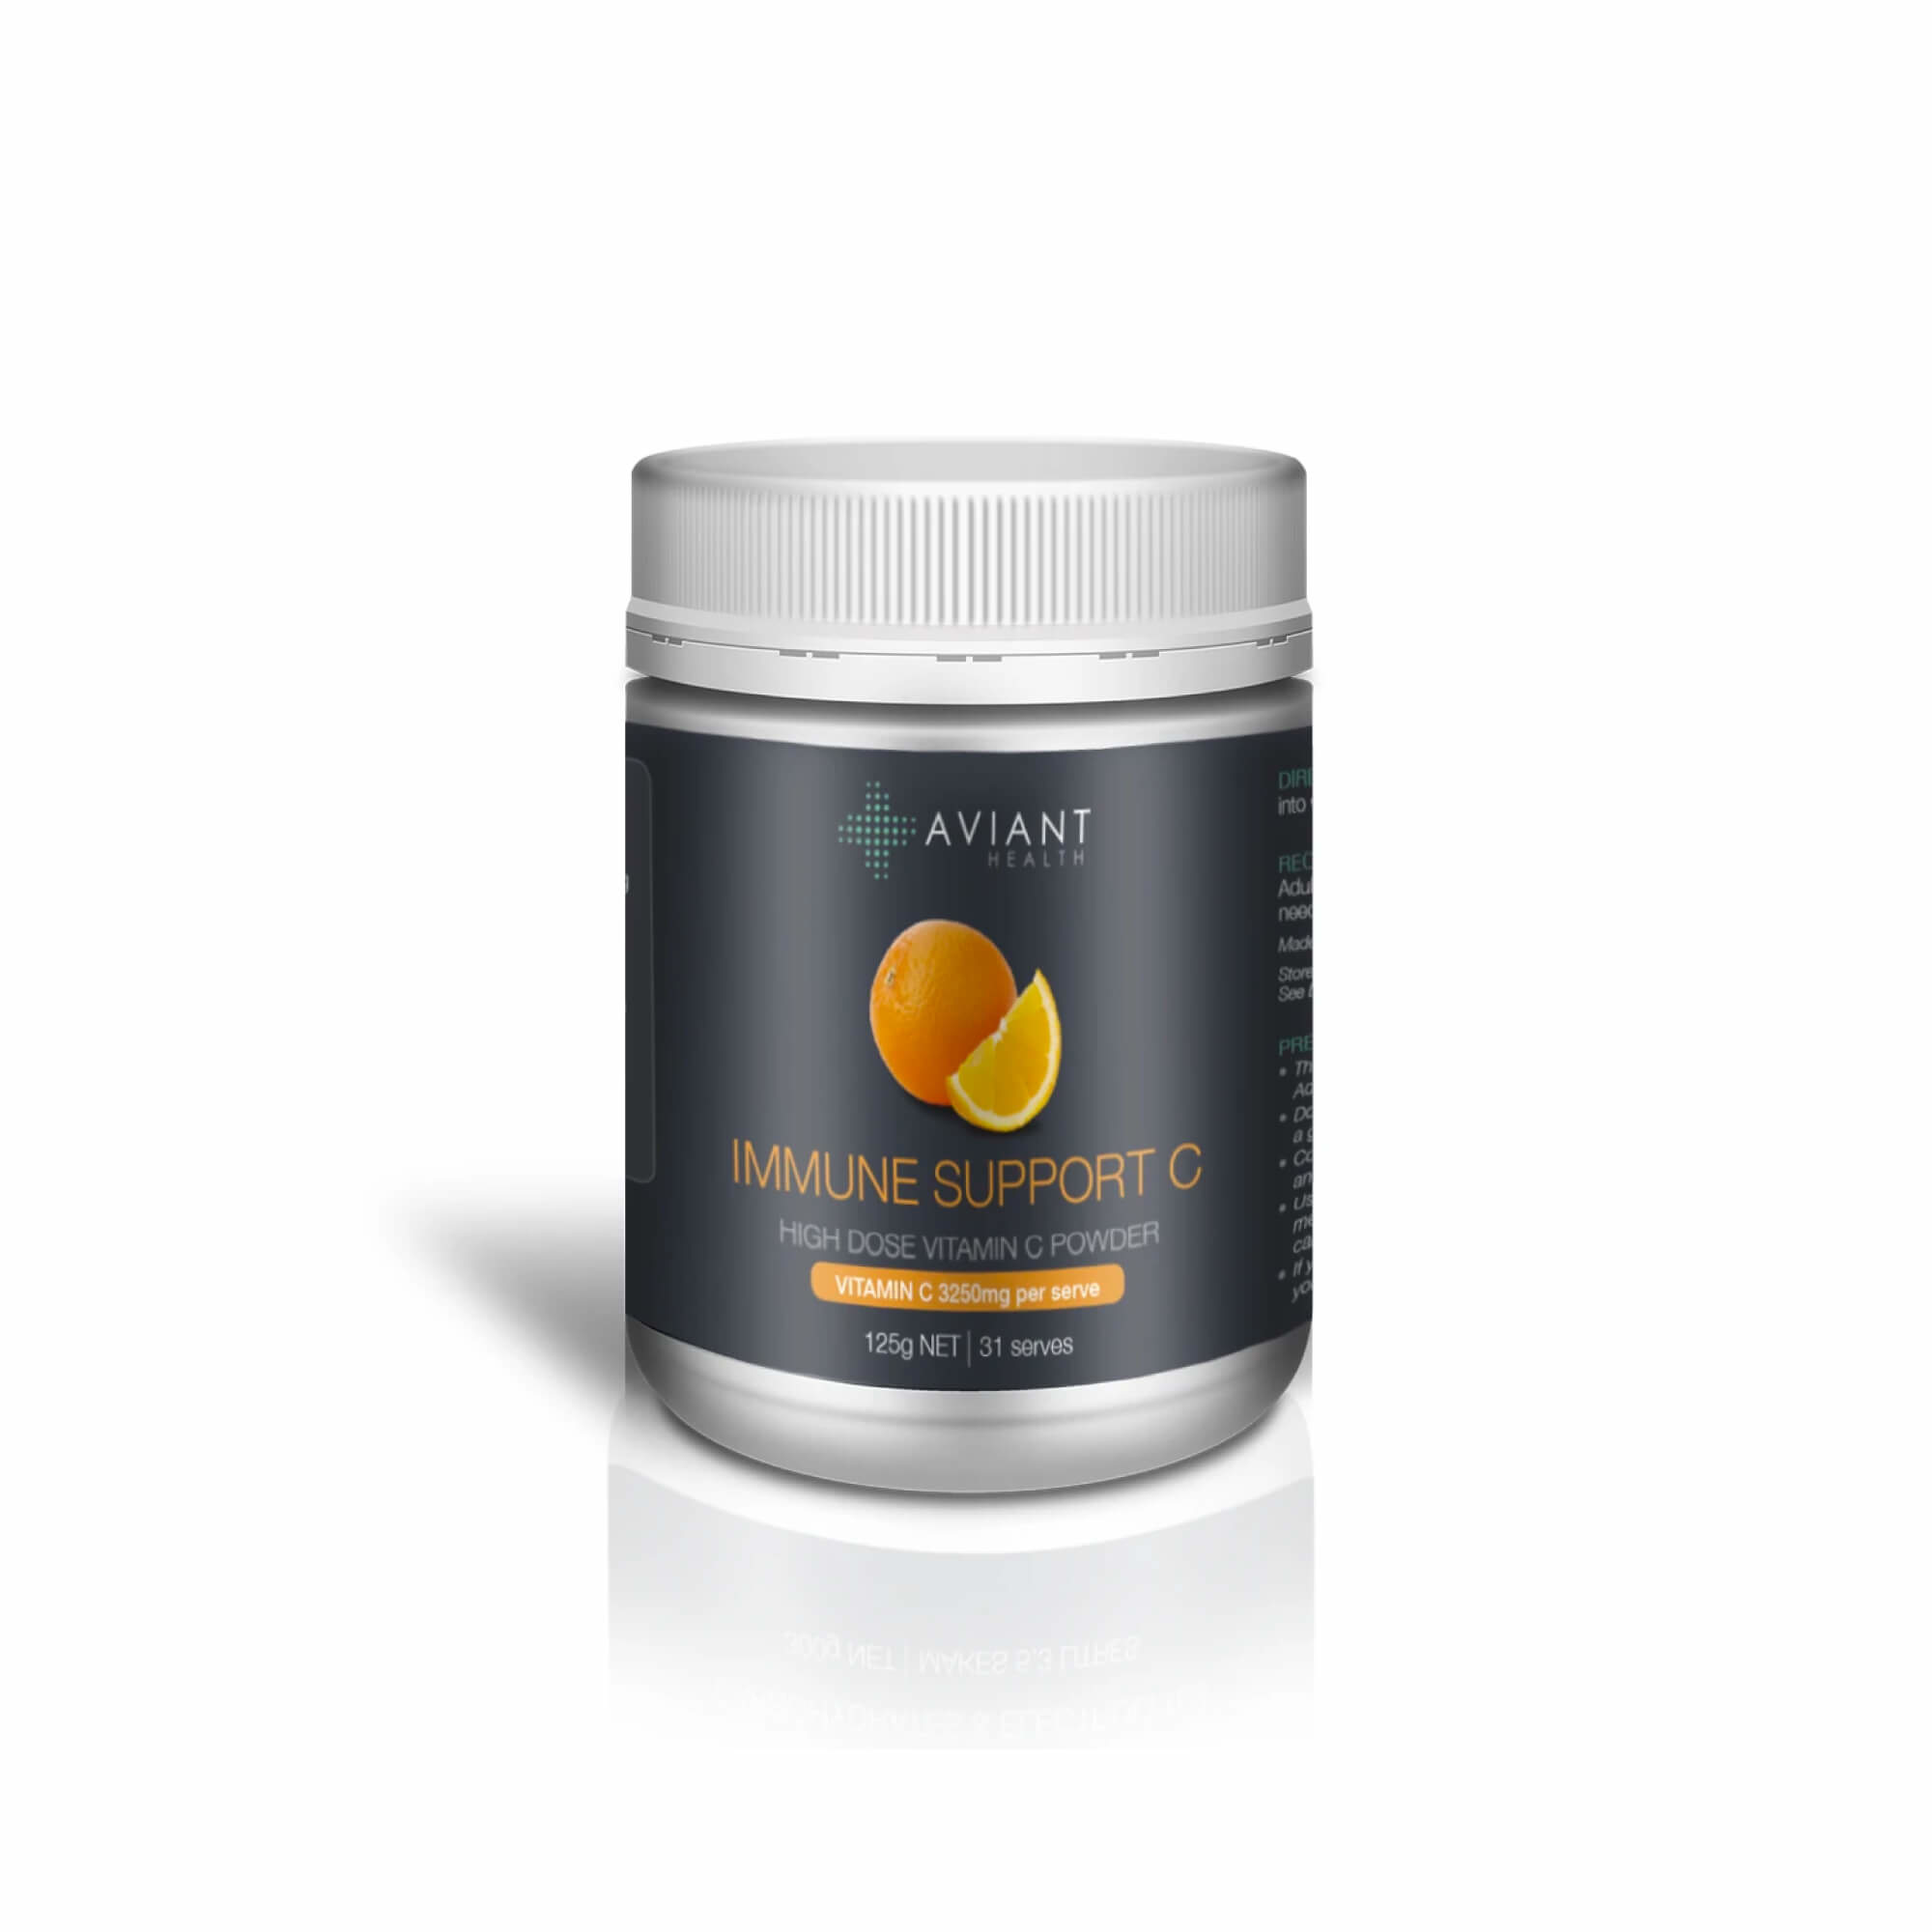 Aviant Immune Support C - High Dose Vitamin C Powder 125g-1